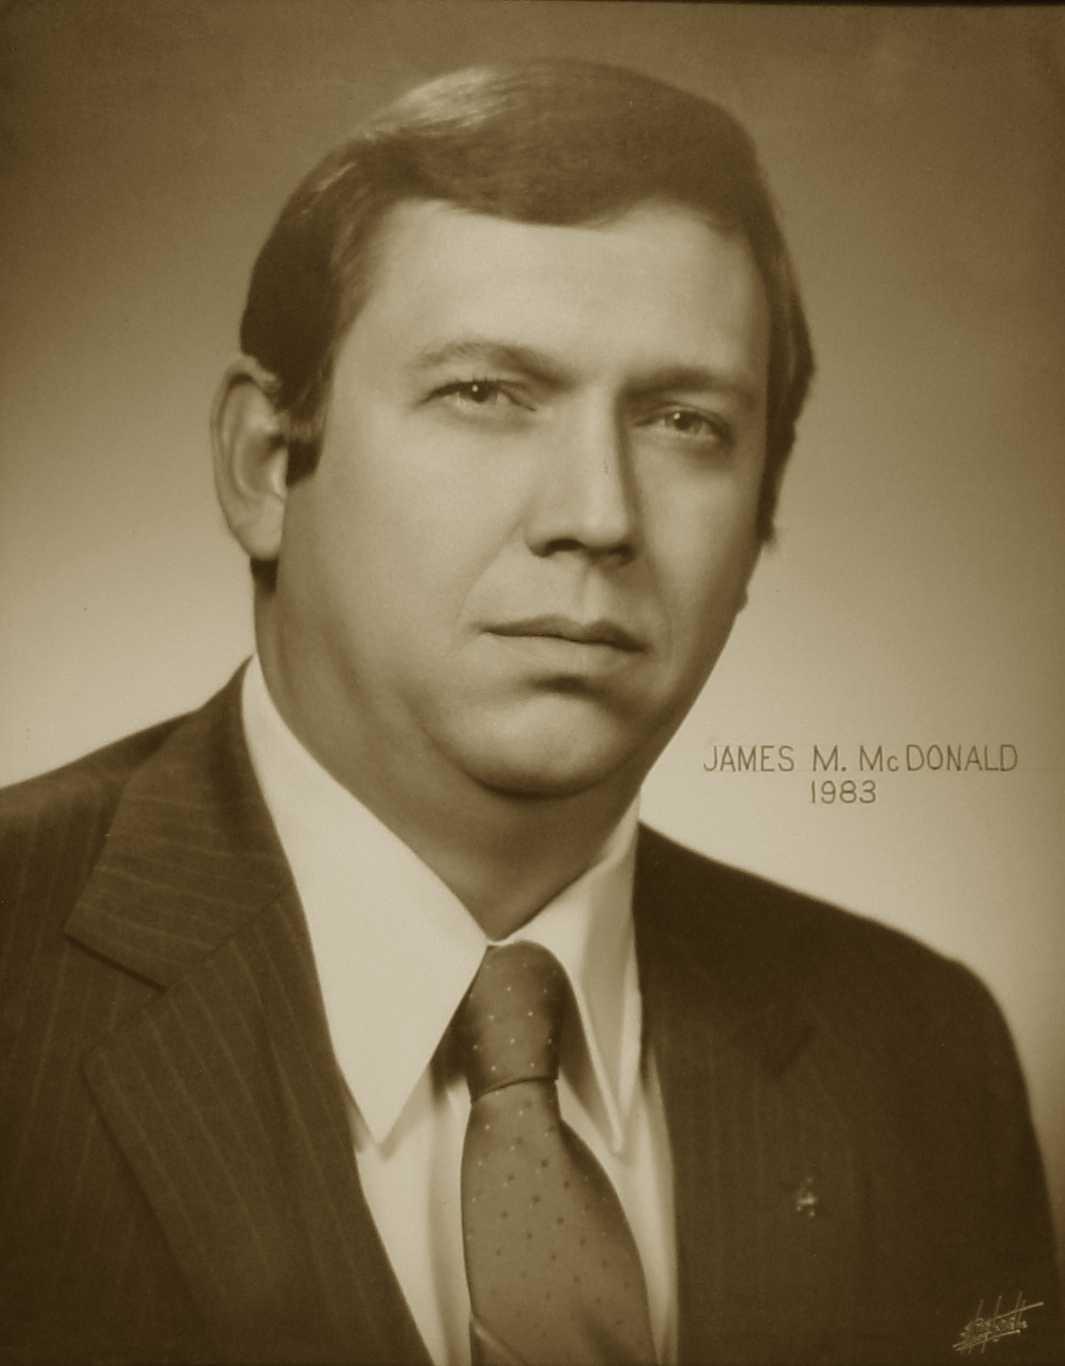 James M. McDonald, 1983